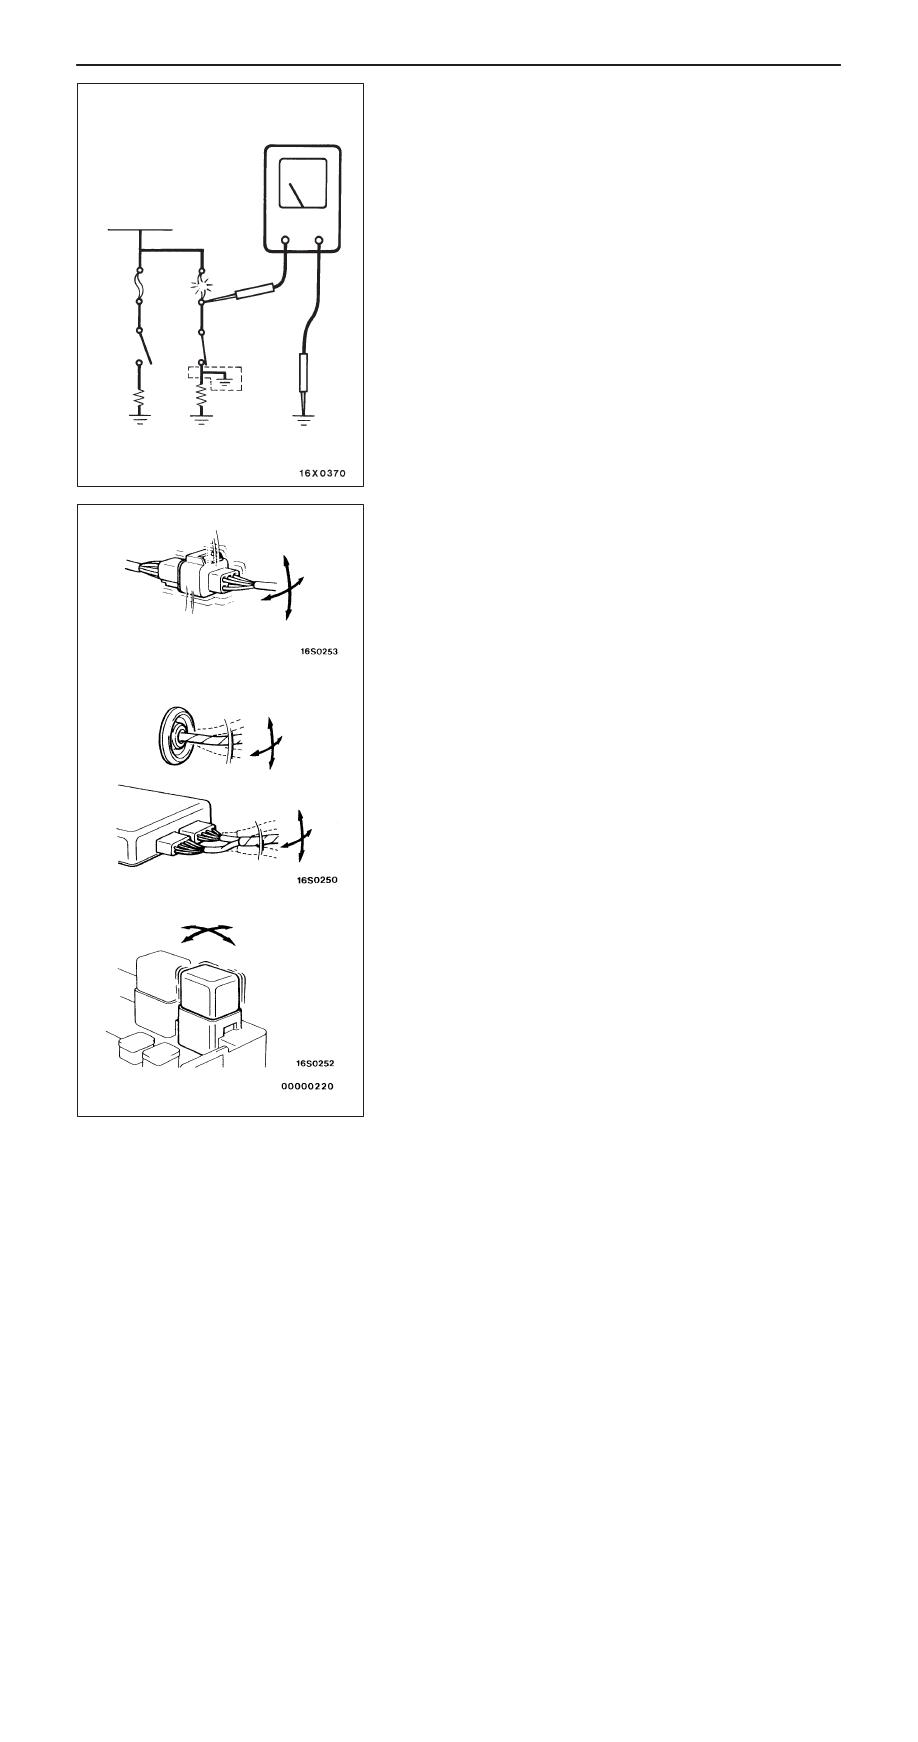 mitsubishi pajero pinin manual part 1 rh zinref ru